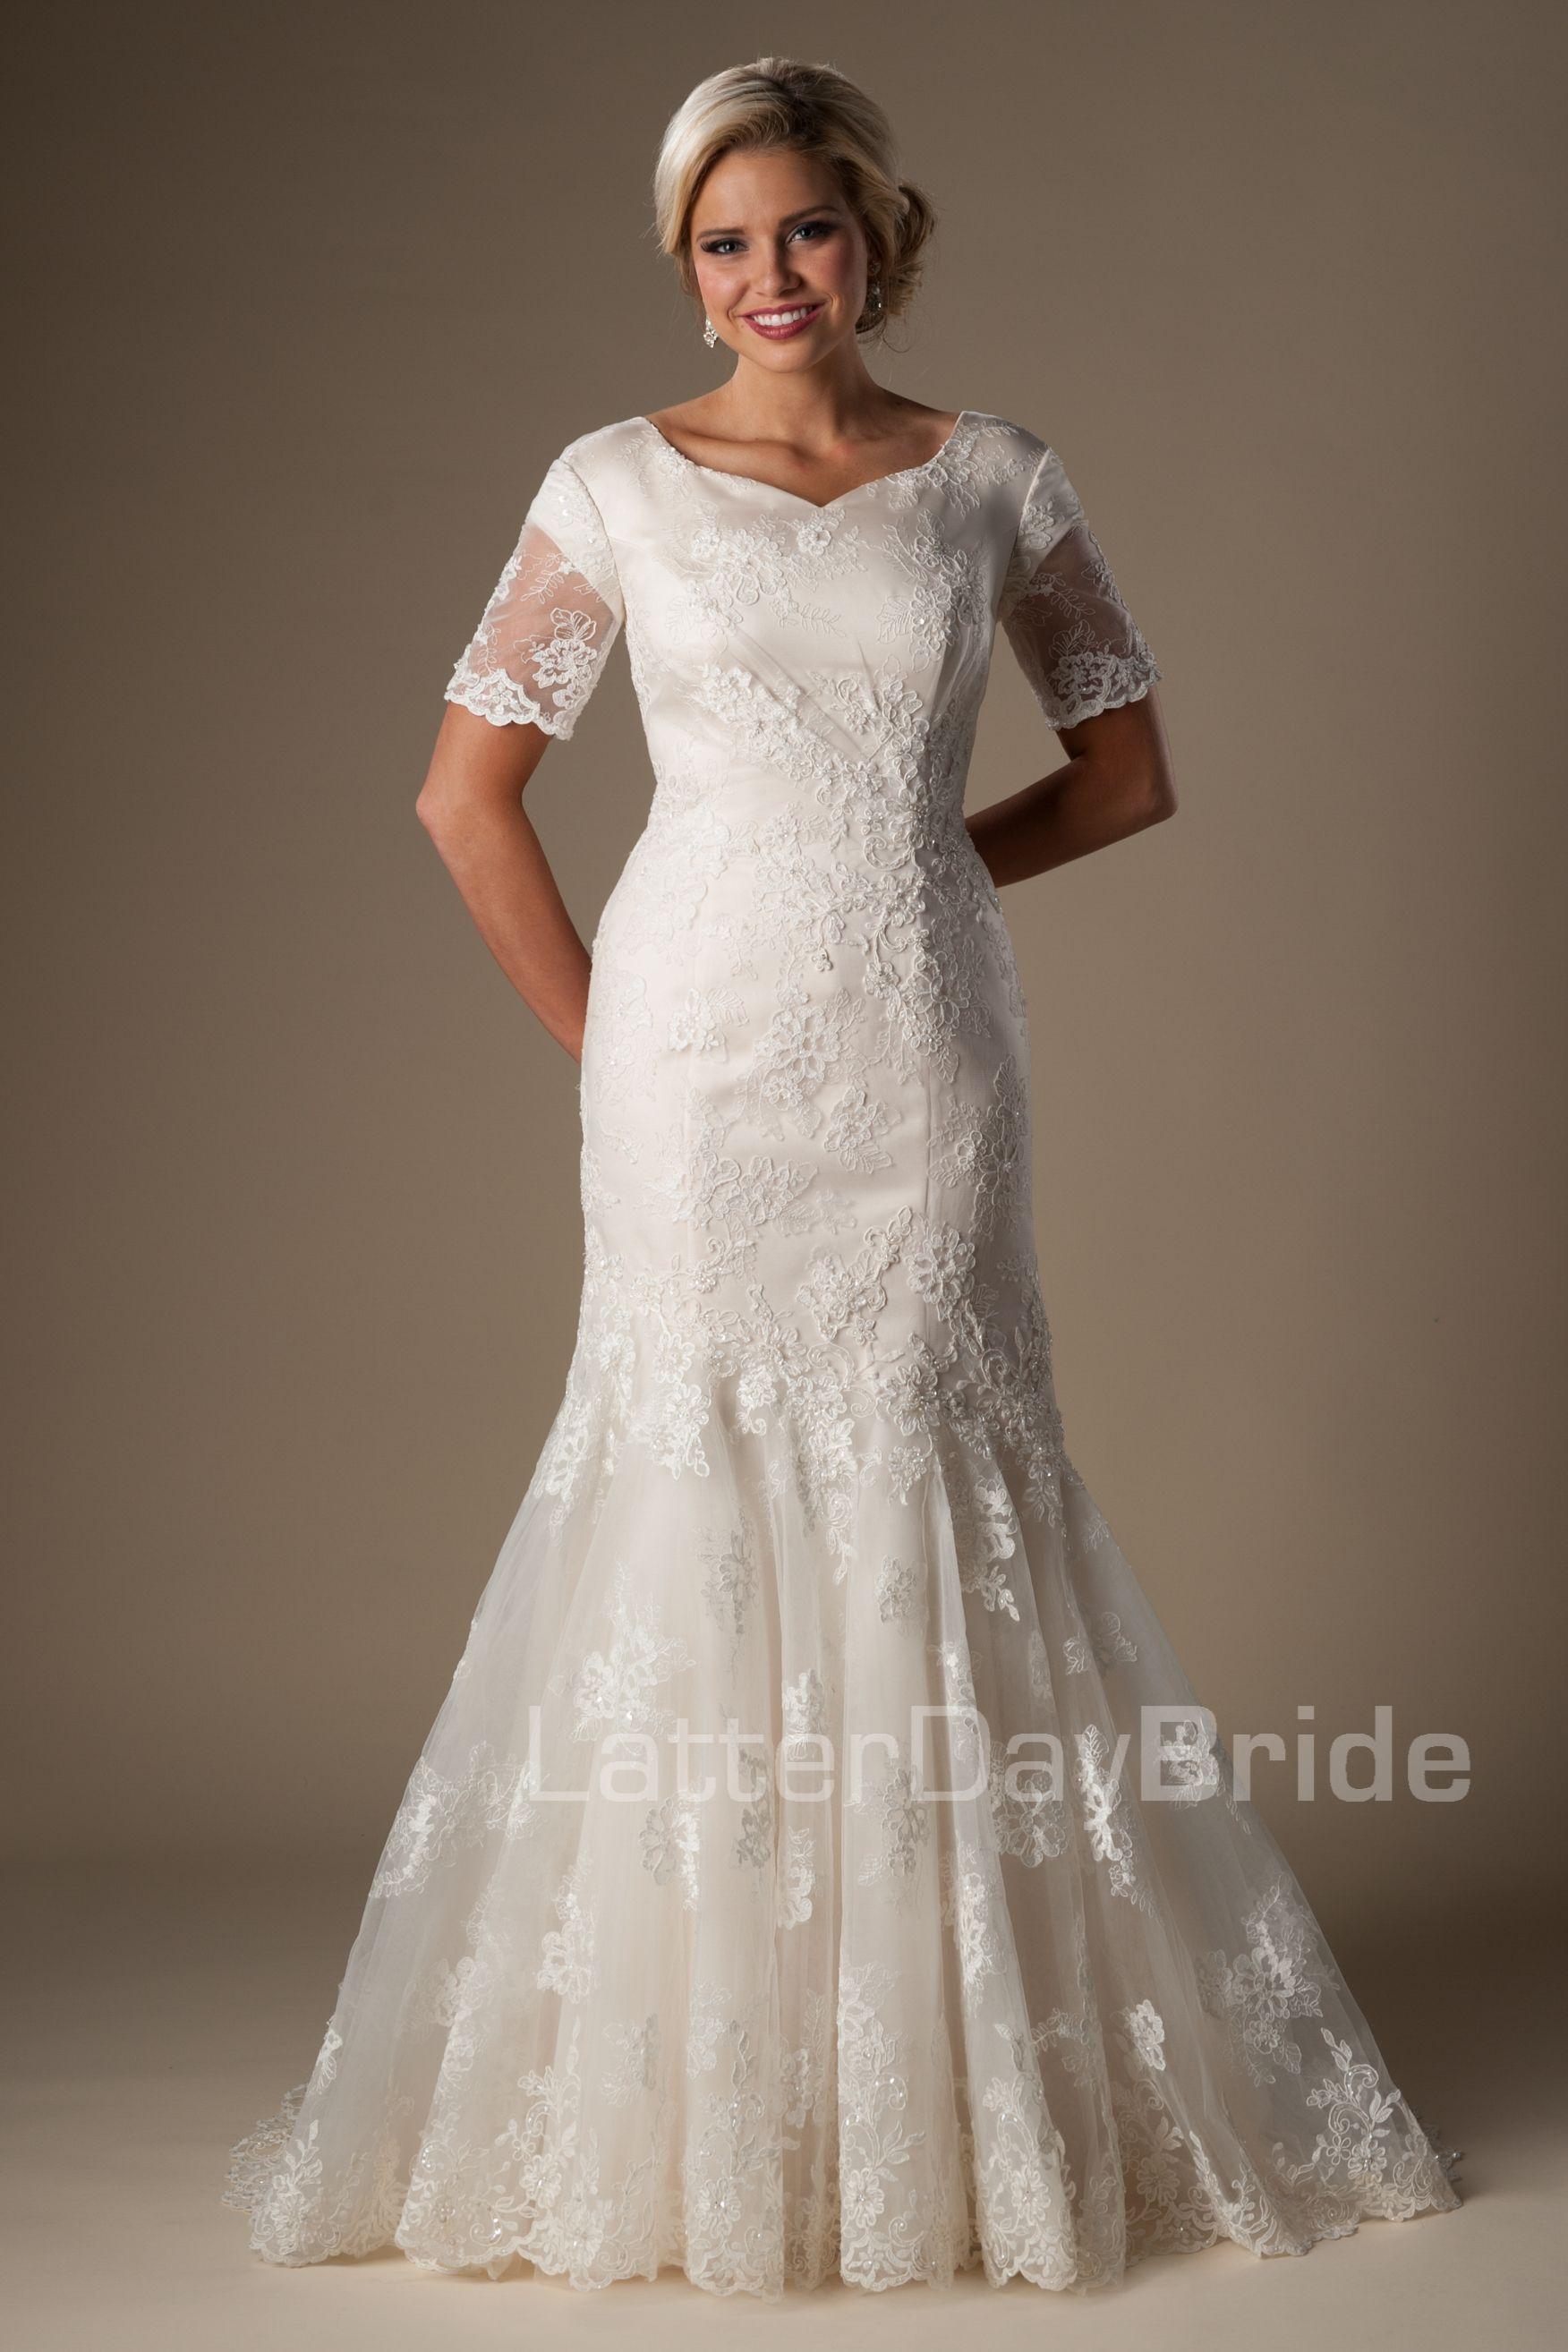 Esperanza Modest Bridal Dresses Modest Wedding Dresses Wedding Dresses [ 2628 x 1752 Pixel ]